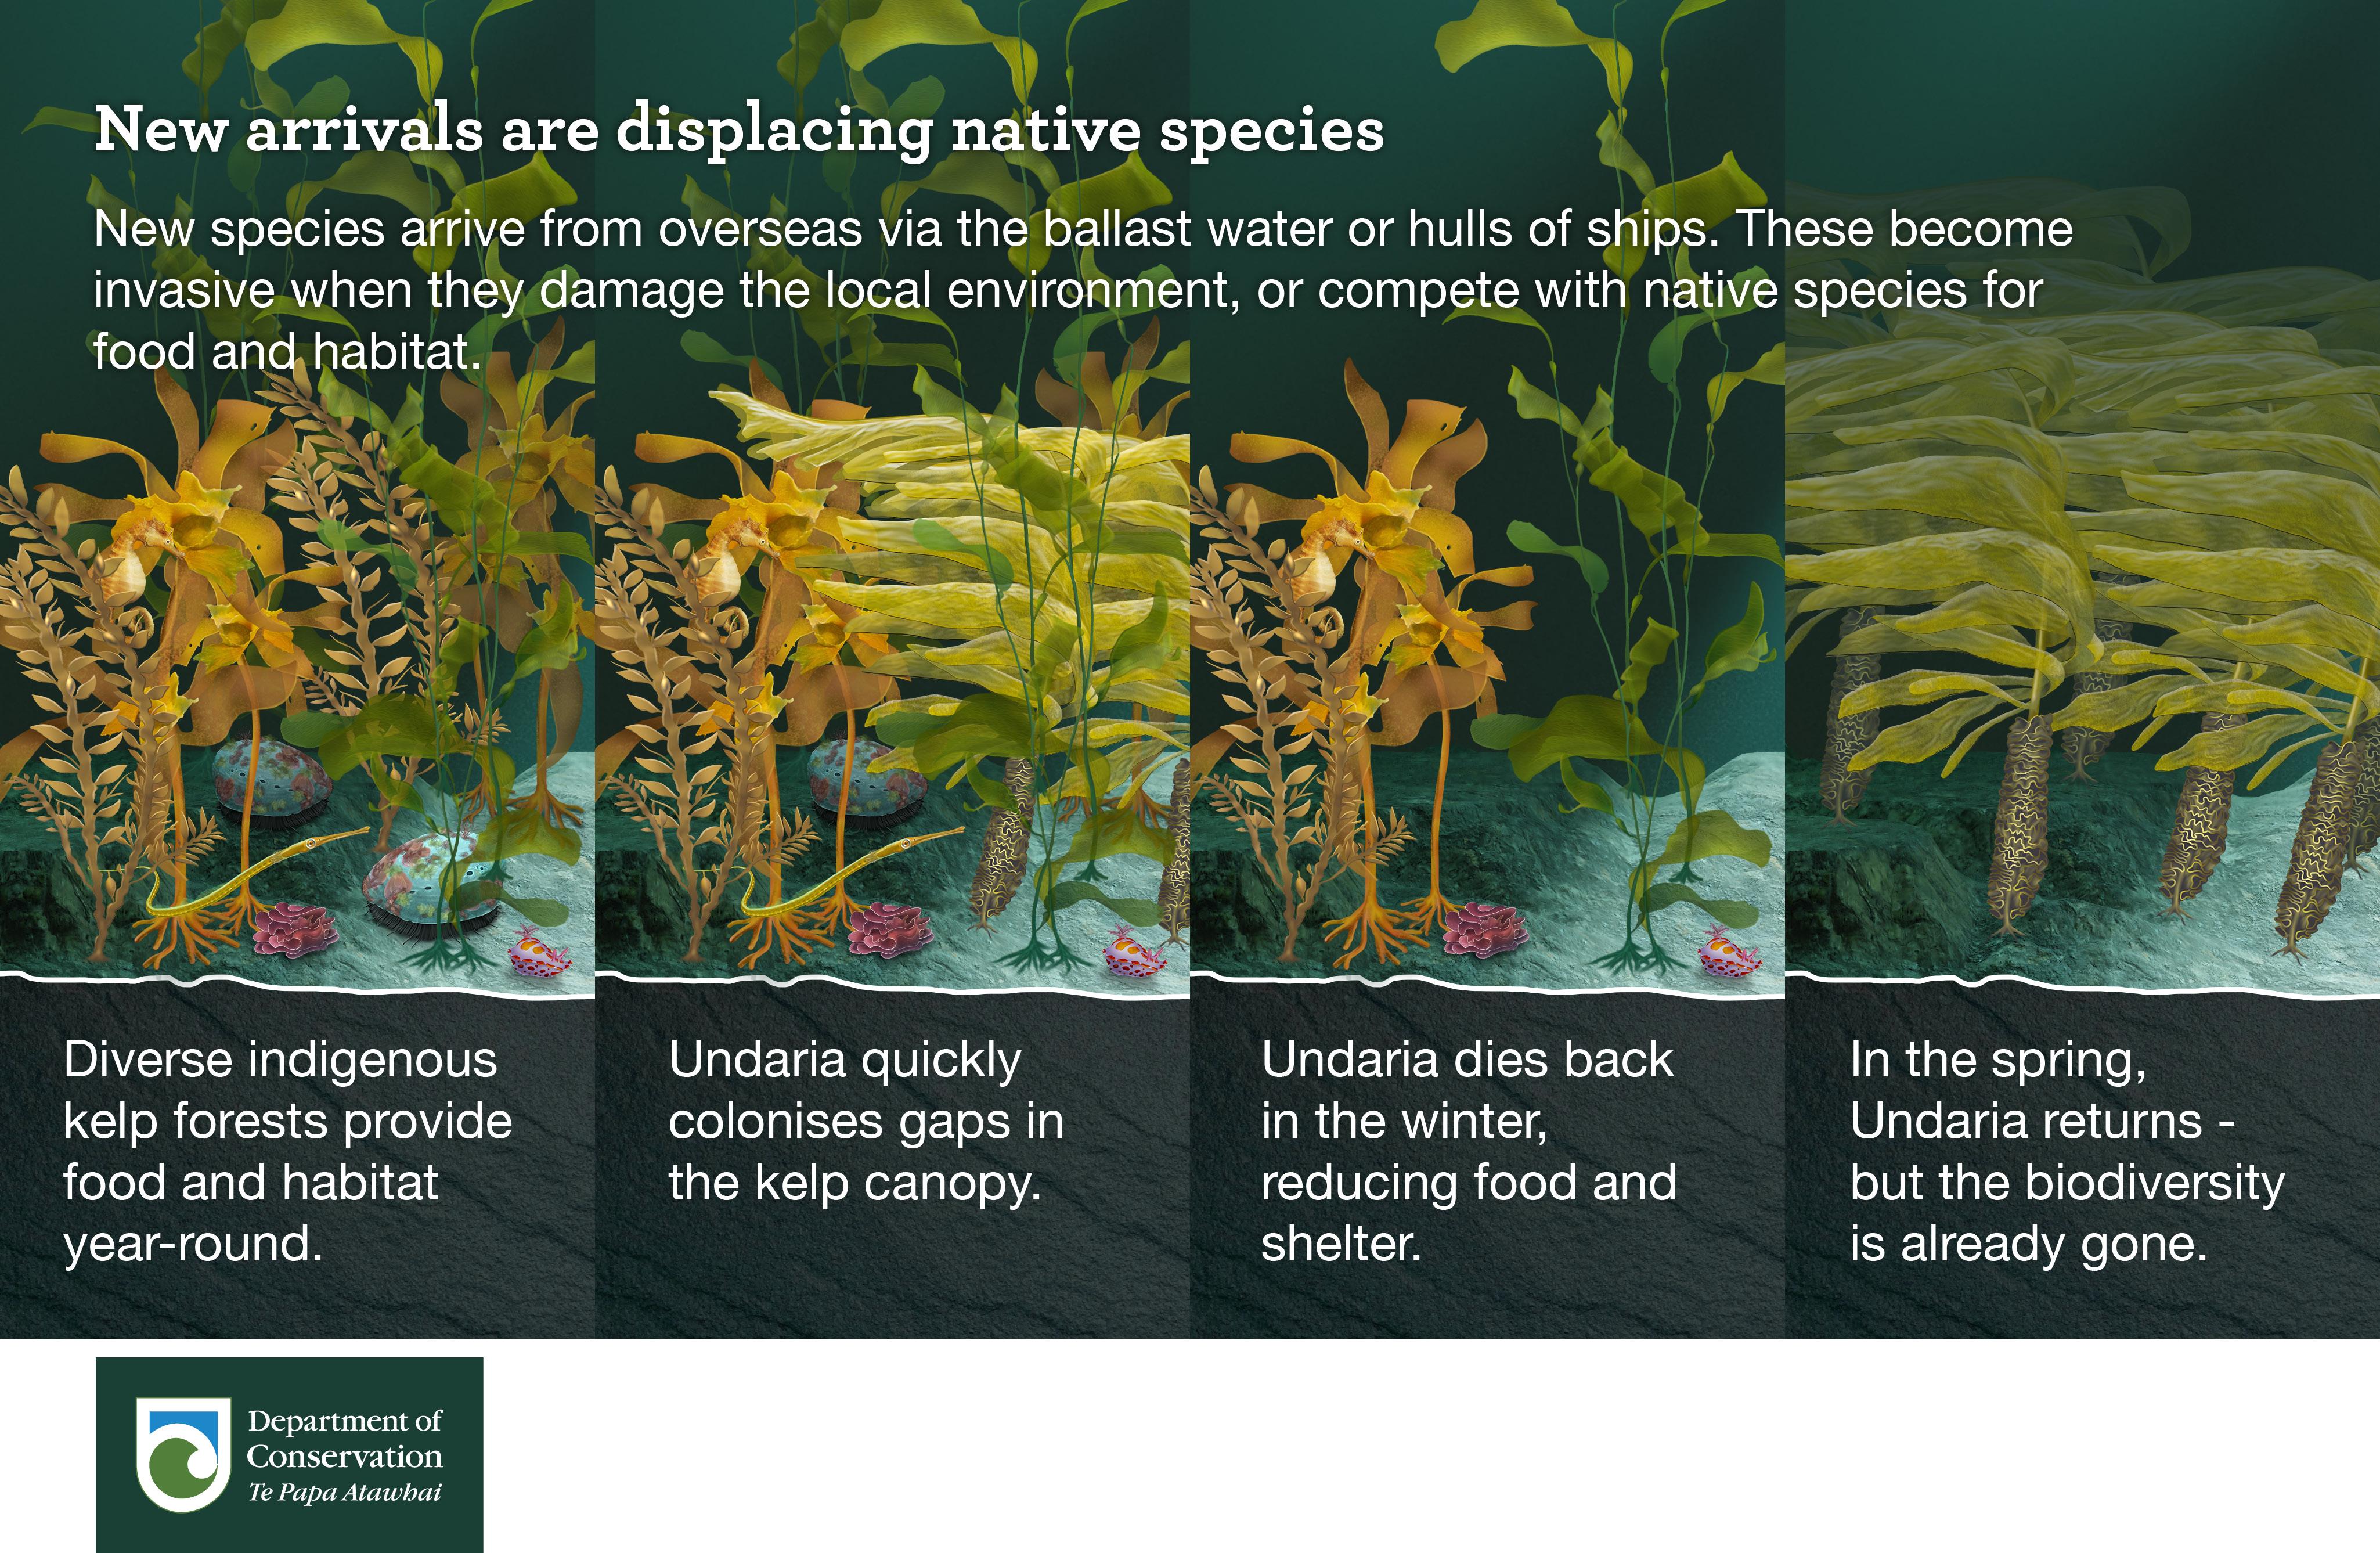 New arrivals are displacing native species